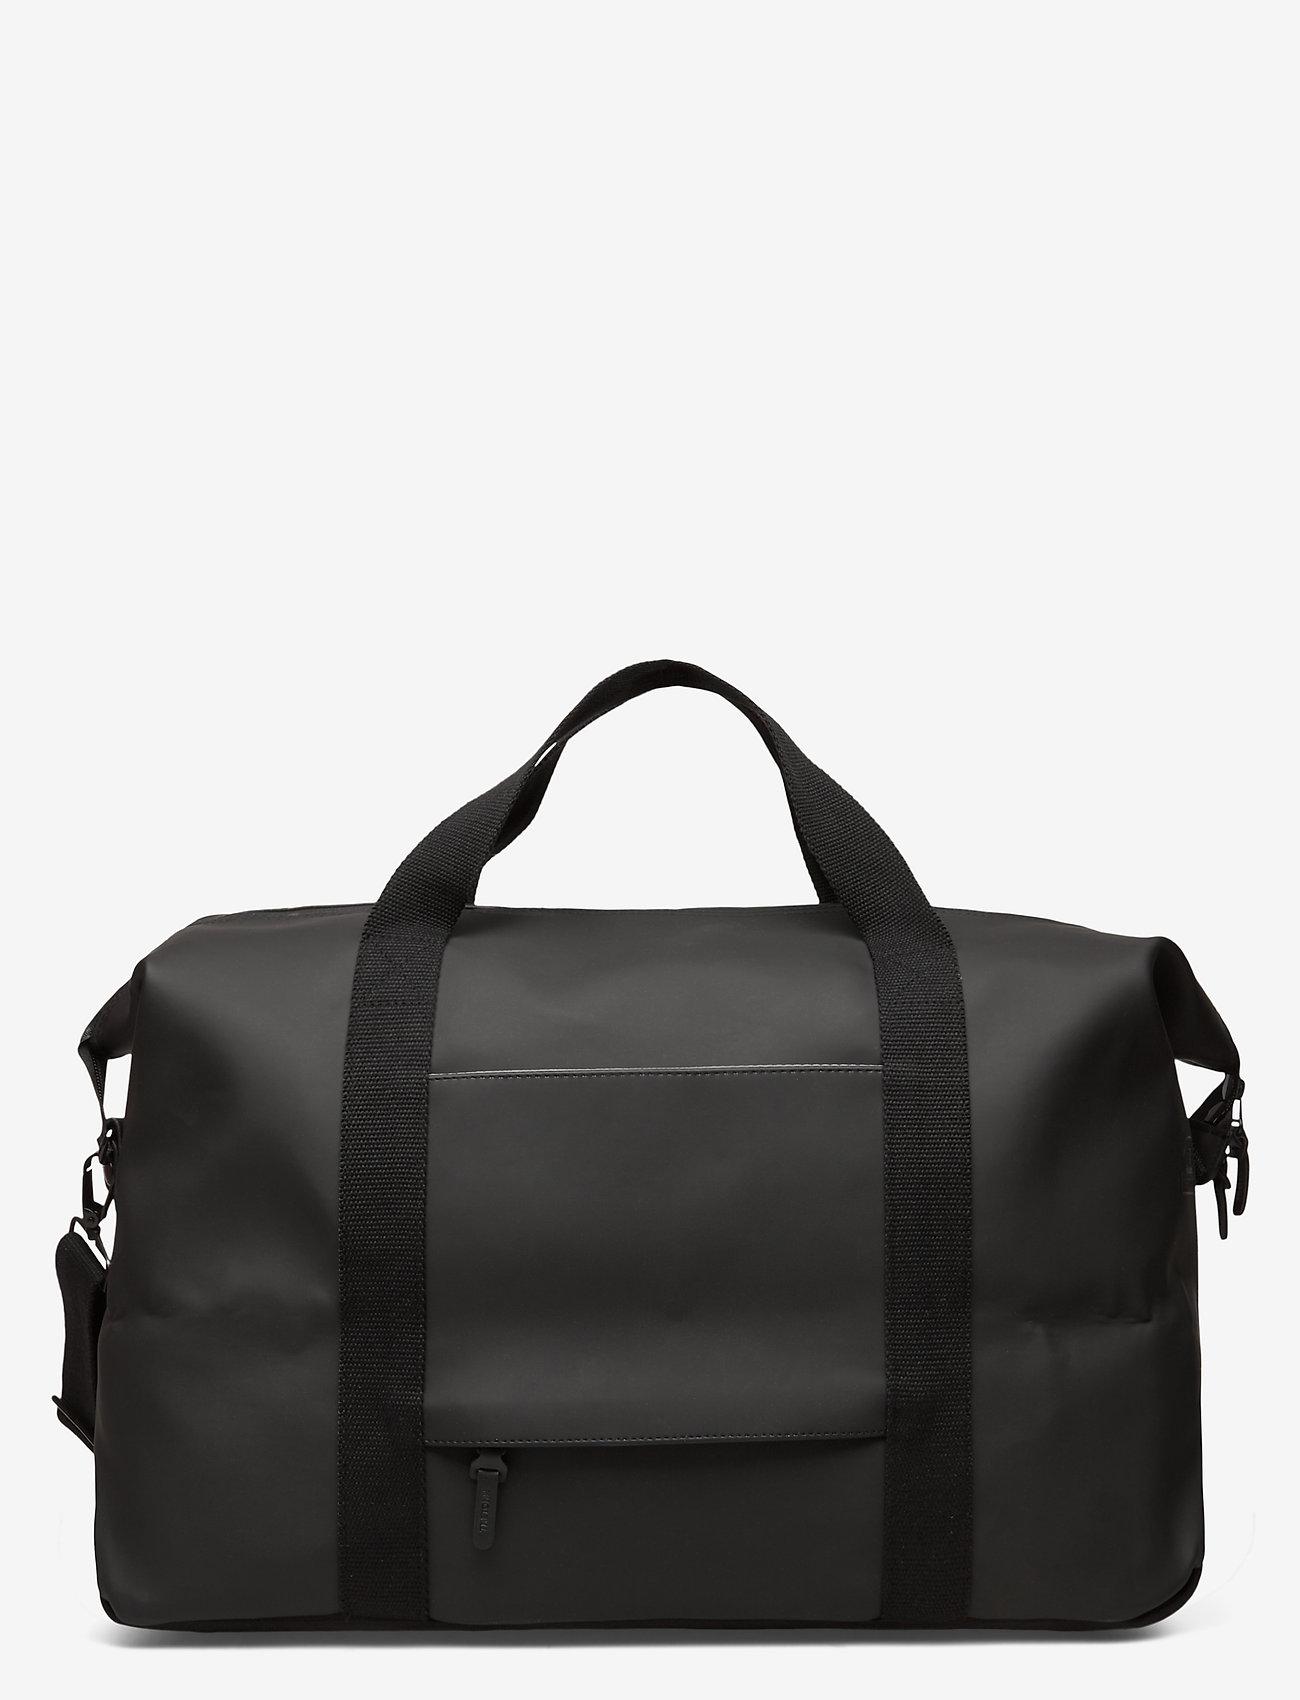 Tretorn - FR TRAVELBAG - sacs de voyage - 010/black - 1